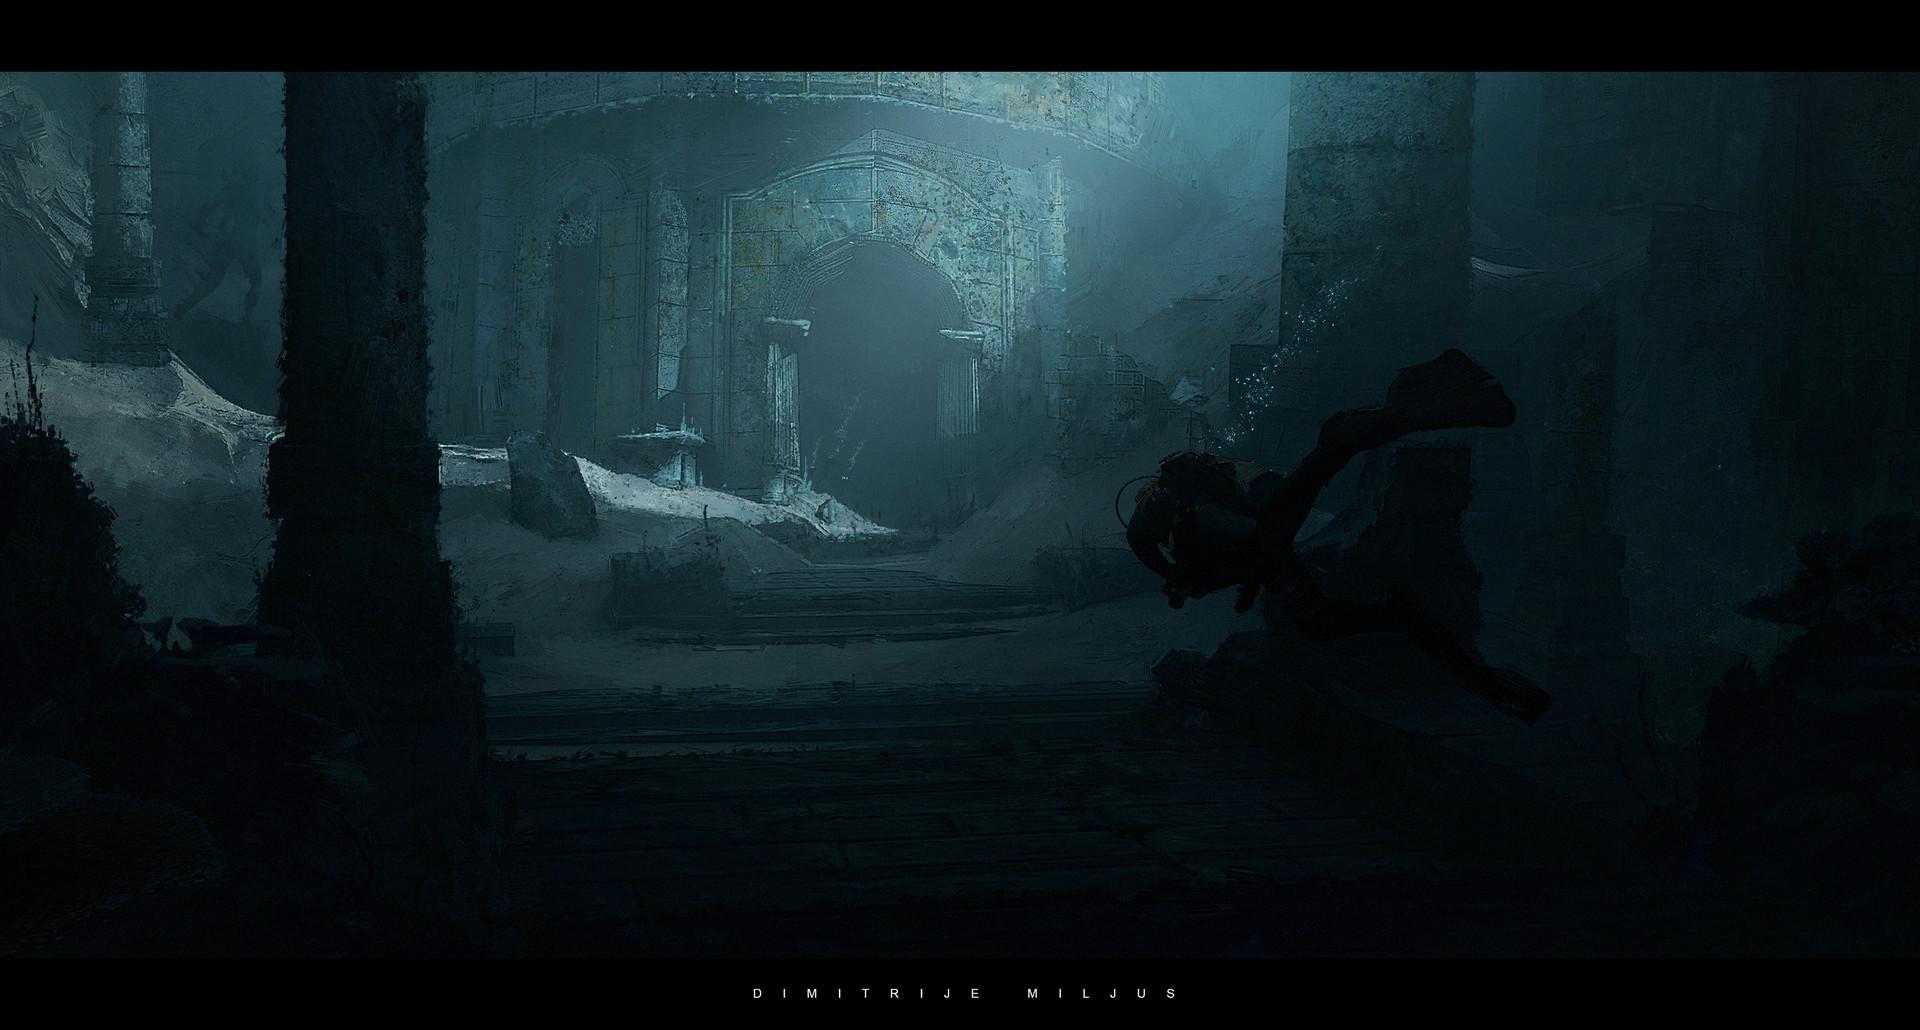 Dimitrije miljus ruins1